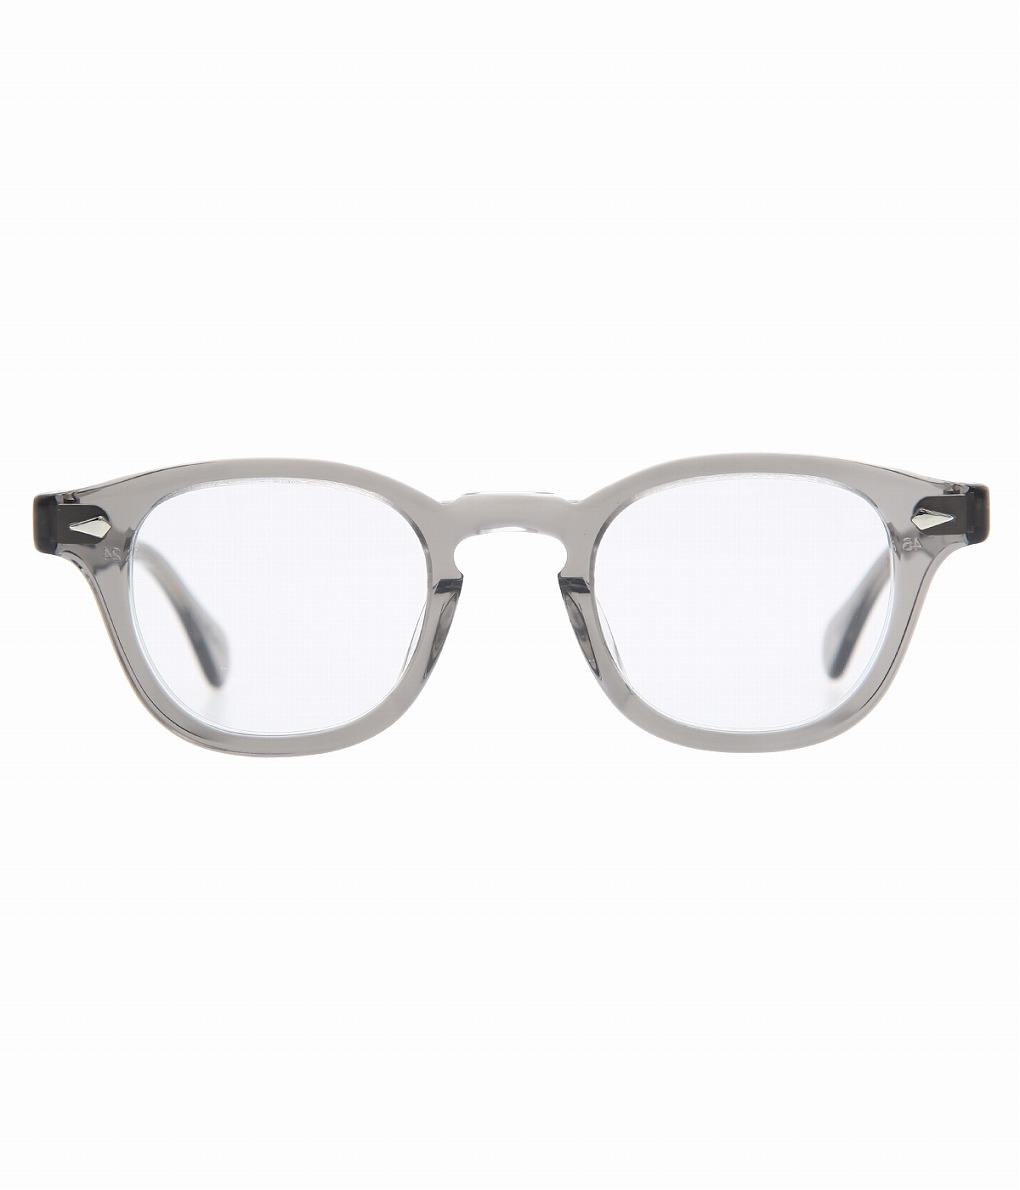 JULIUS TART OPTICAL / ジュリアスタートオプティカル : AR 46-24 - GREY CRYSTAL / CLEAR - : メガネ 眼鏡 アイウェア : JTPL-102L 【COR】【WIS】